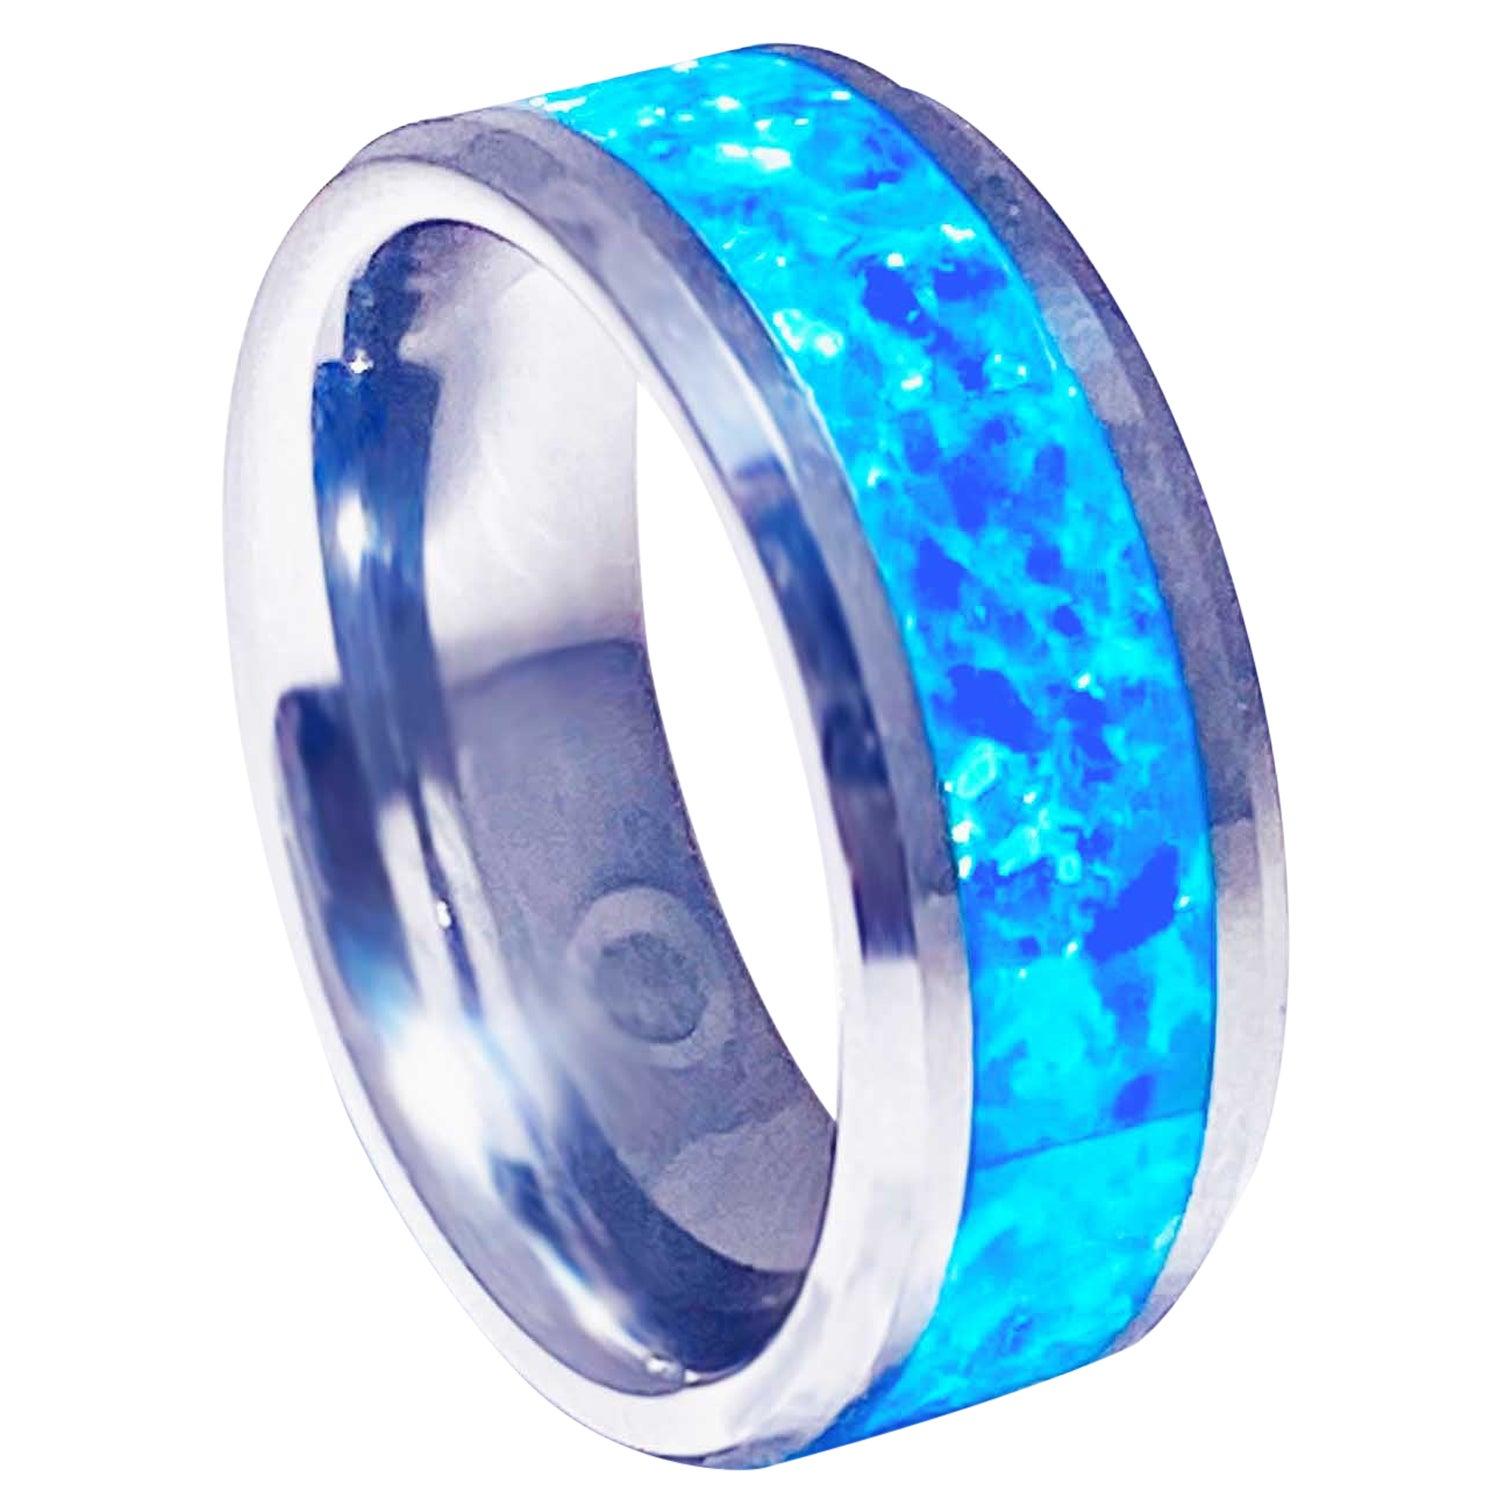 Blue Opal Inlay Tungsten Steel Men's Band, Genuine Opal Ring Wide Wedding